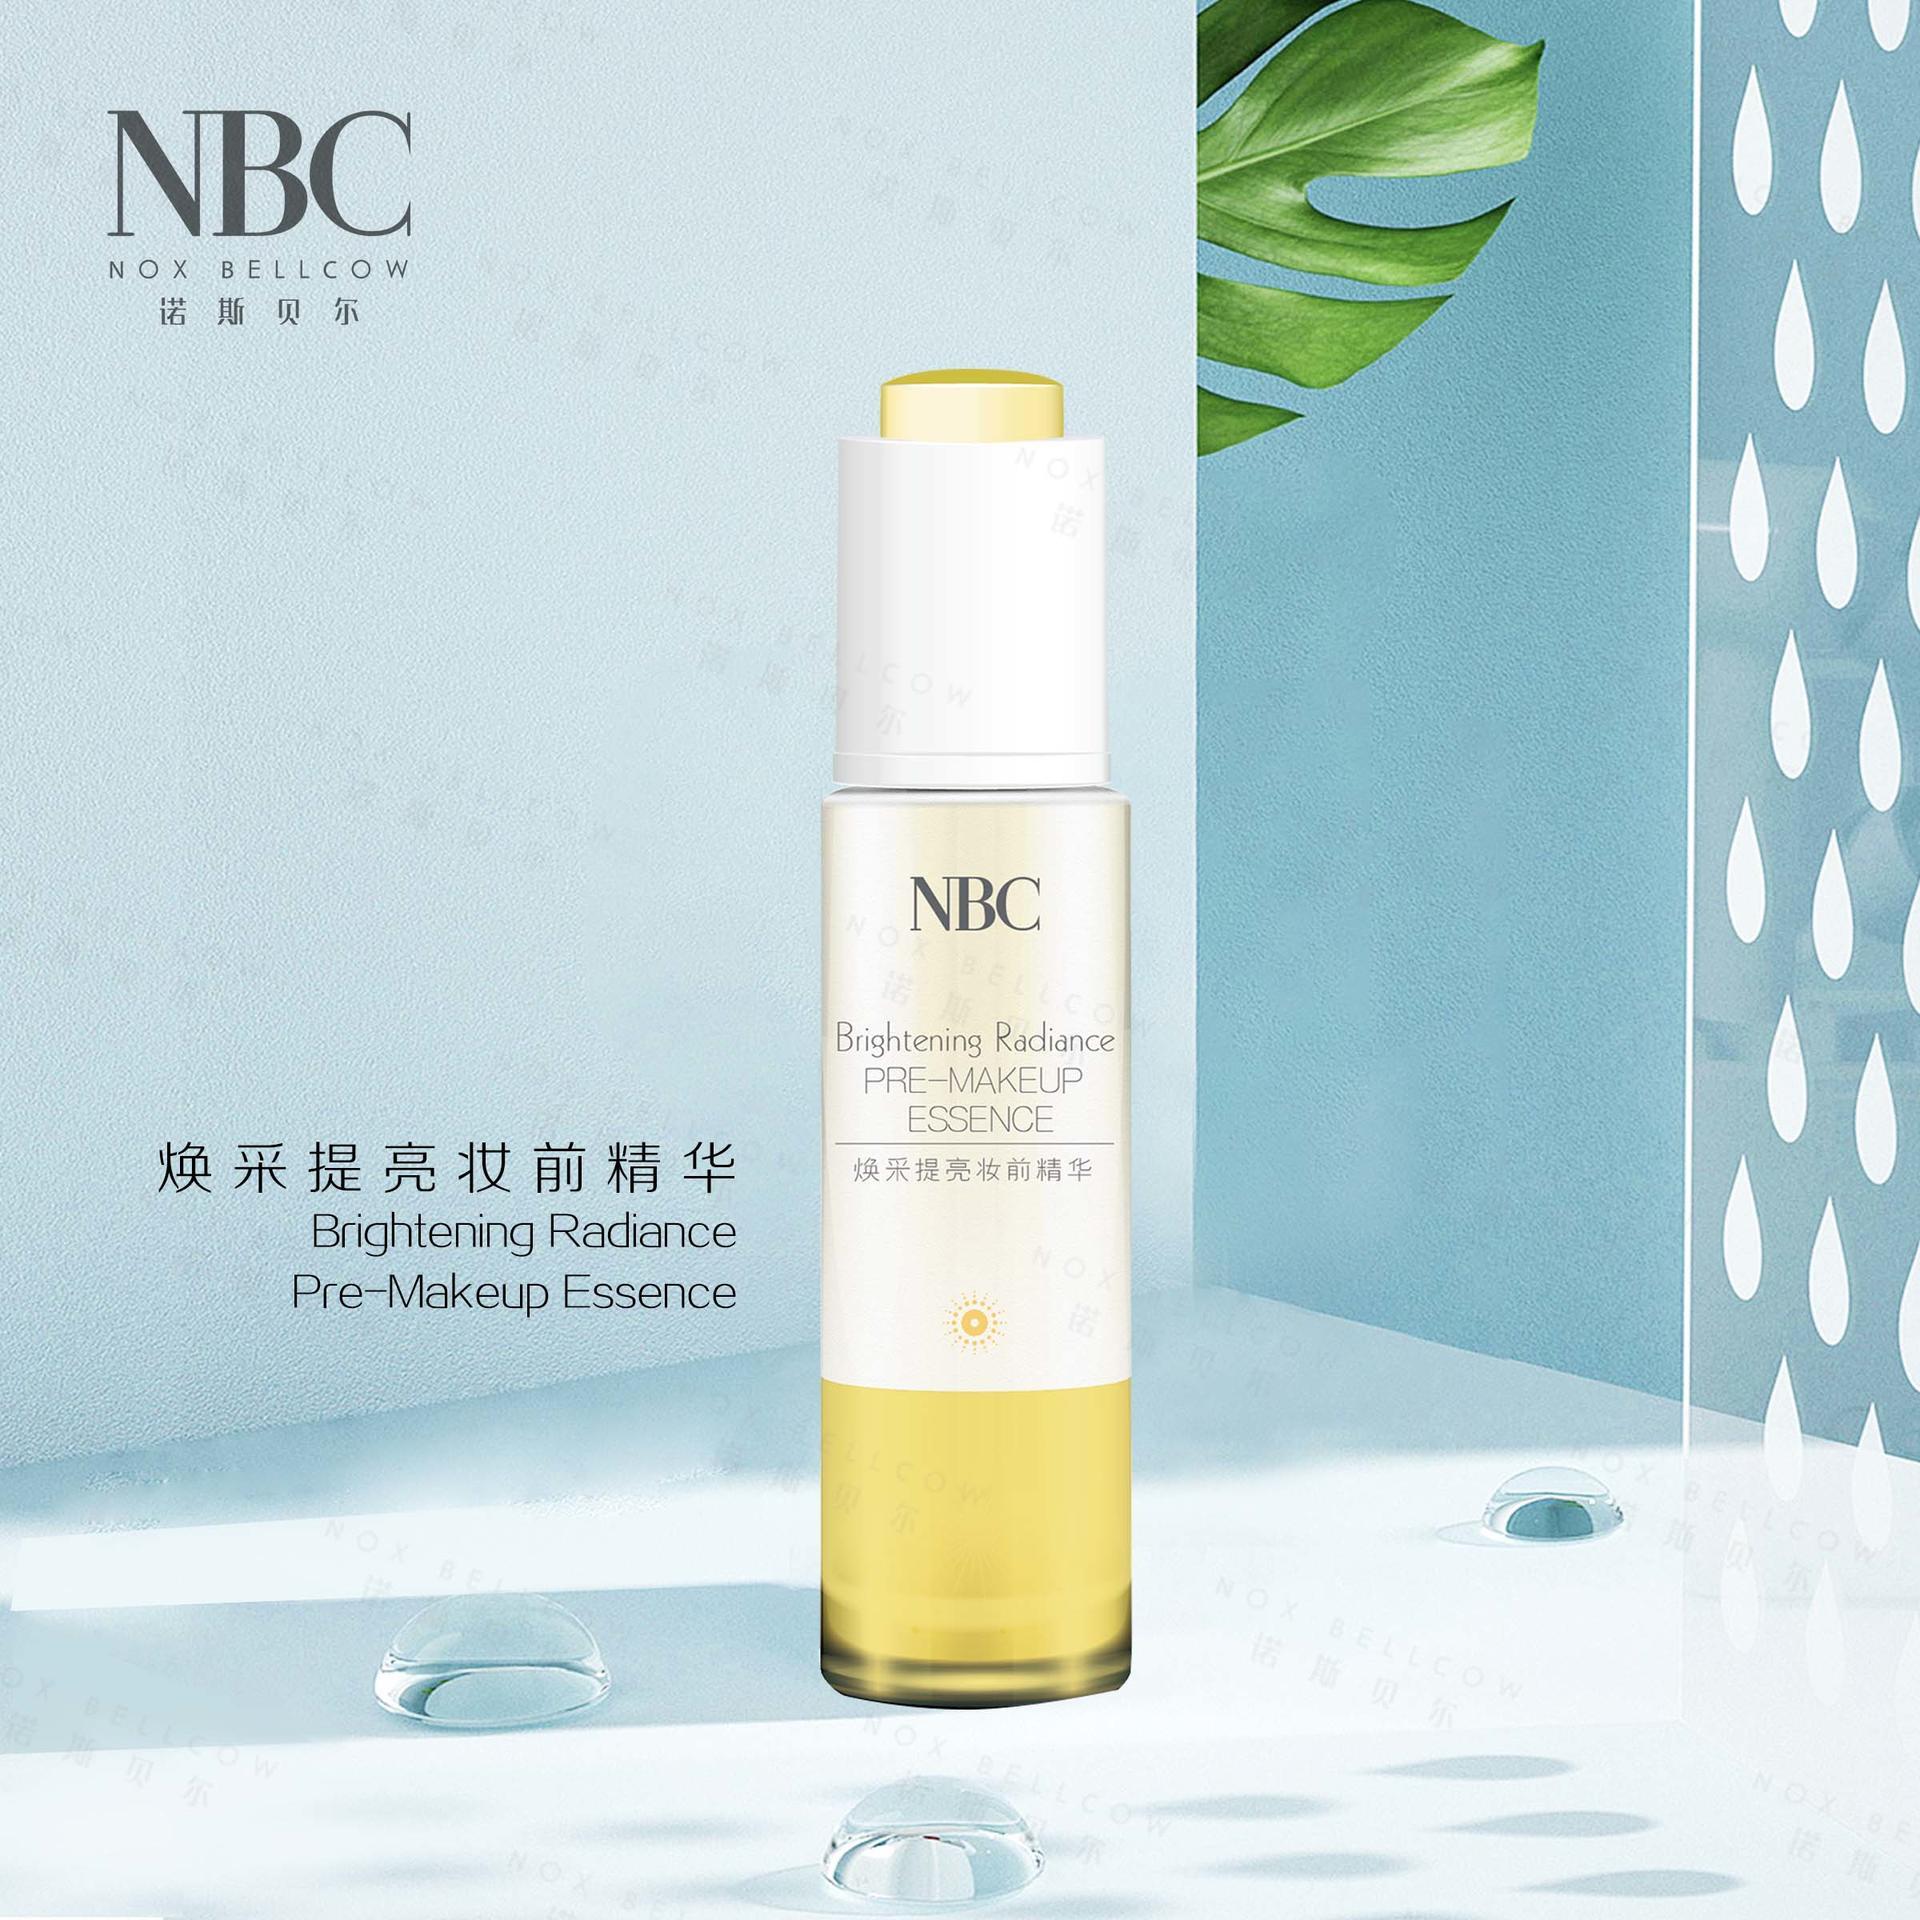 Brightening Radiance Pre-Makeup Essence